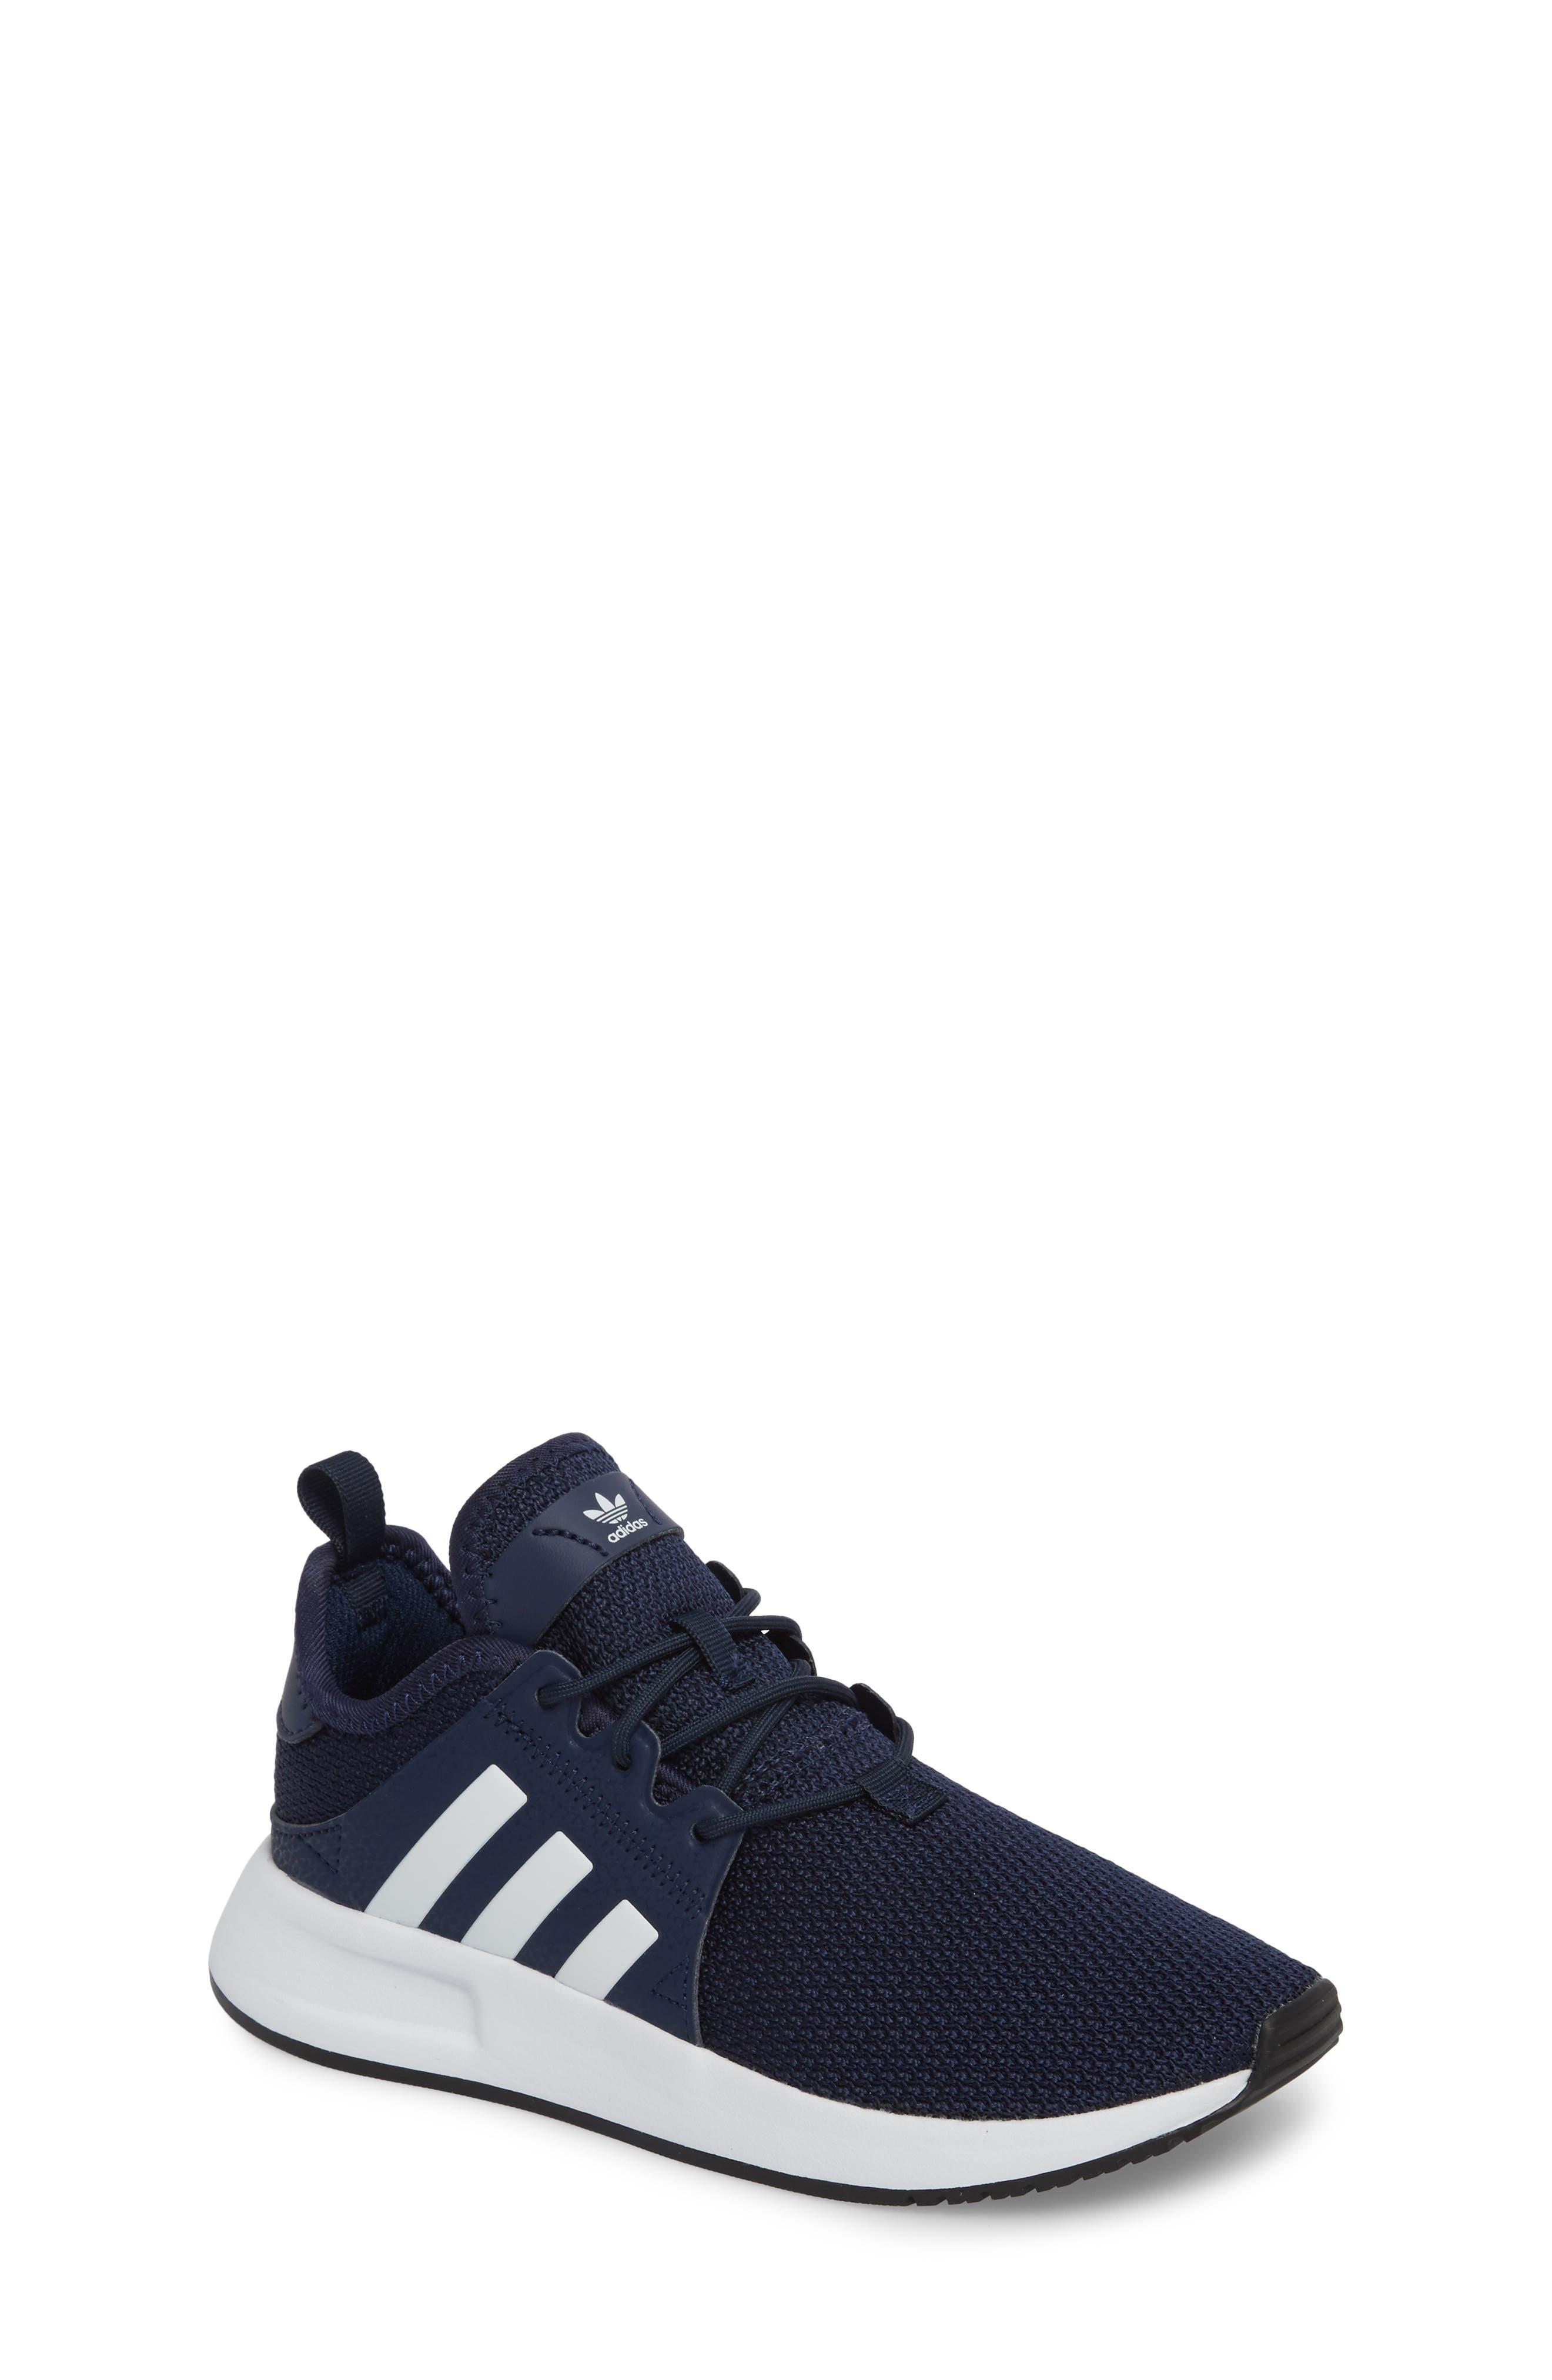 X_PLR Sneaker,                         Main,                         color, COLLEGIATE NAVY/ WHITE